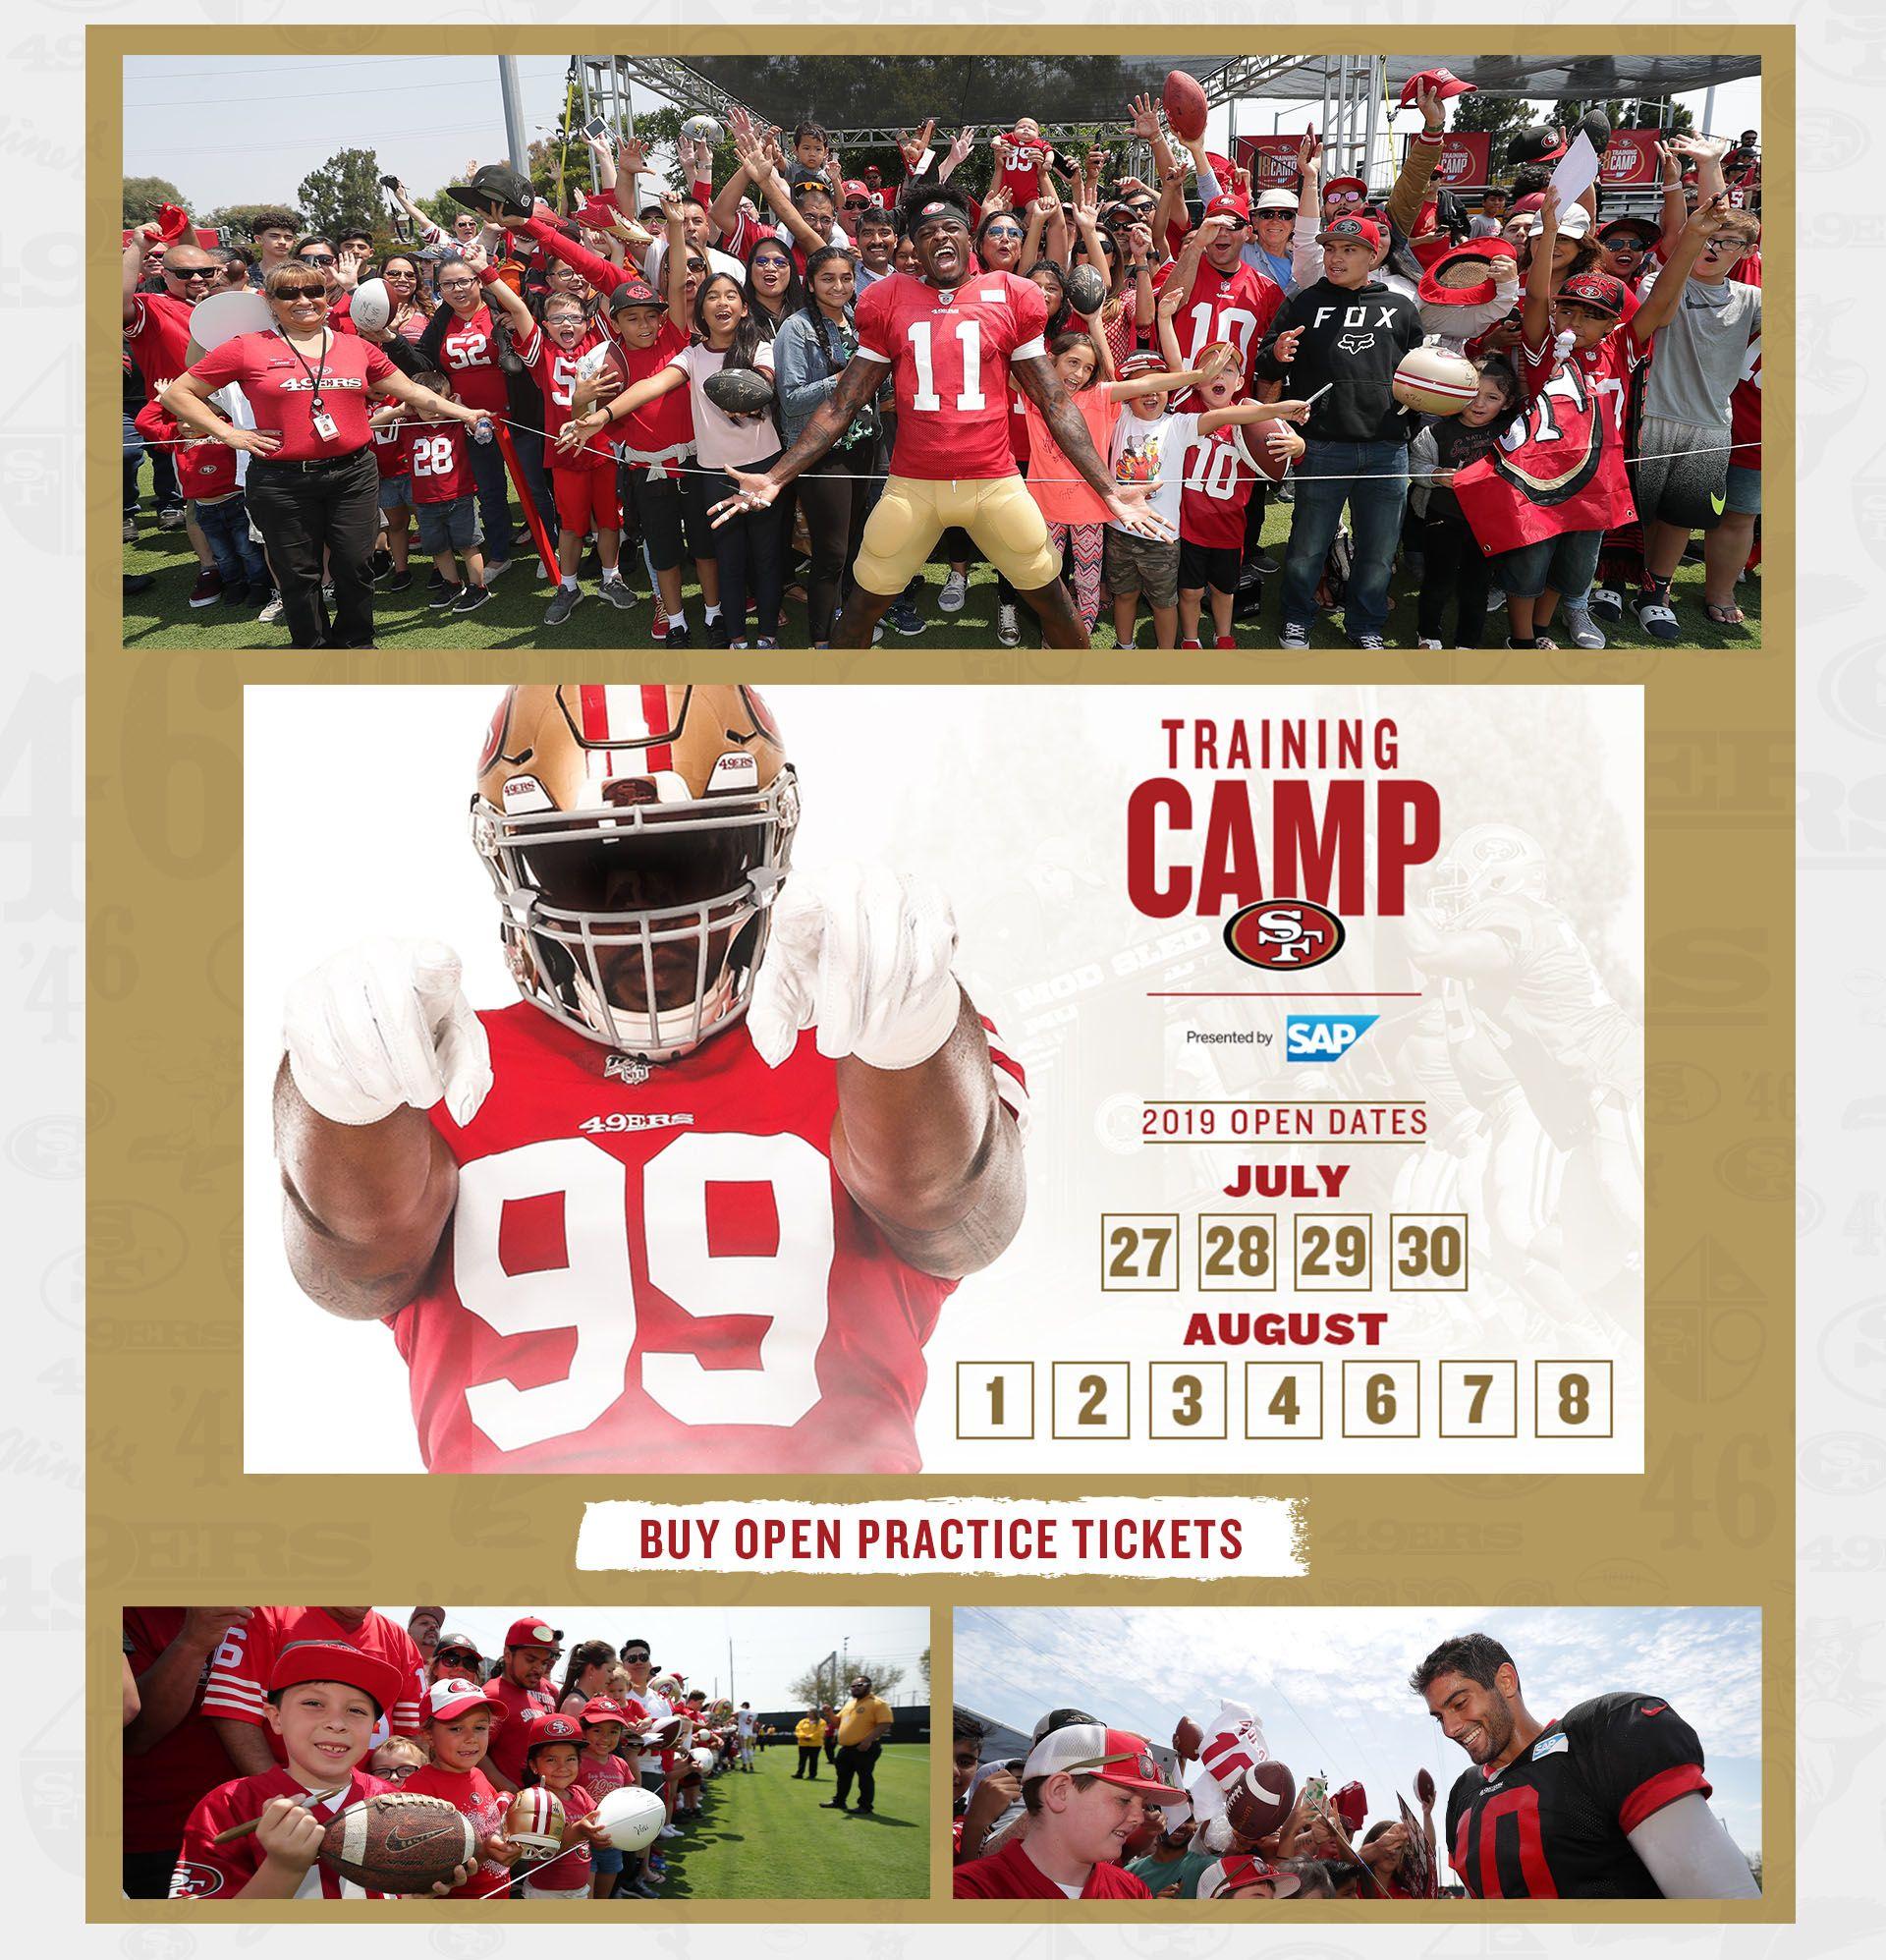 TrainingCamp-Webpage-Training Camp Dates